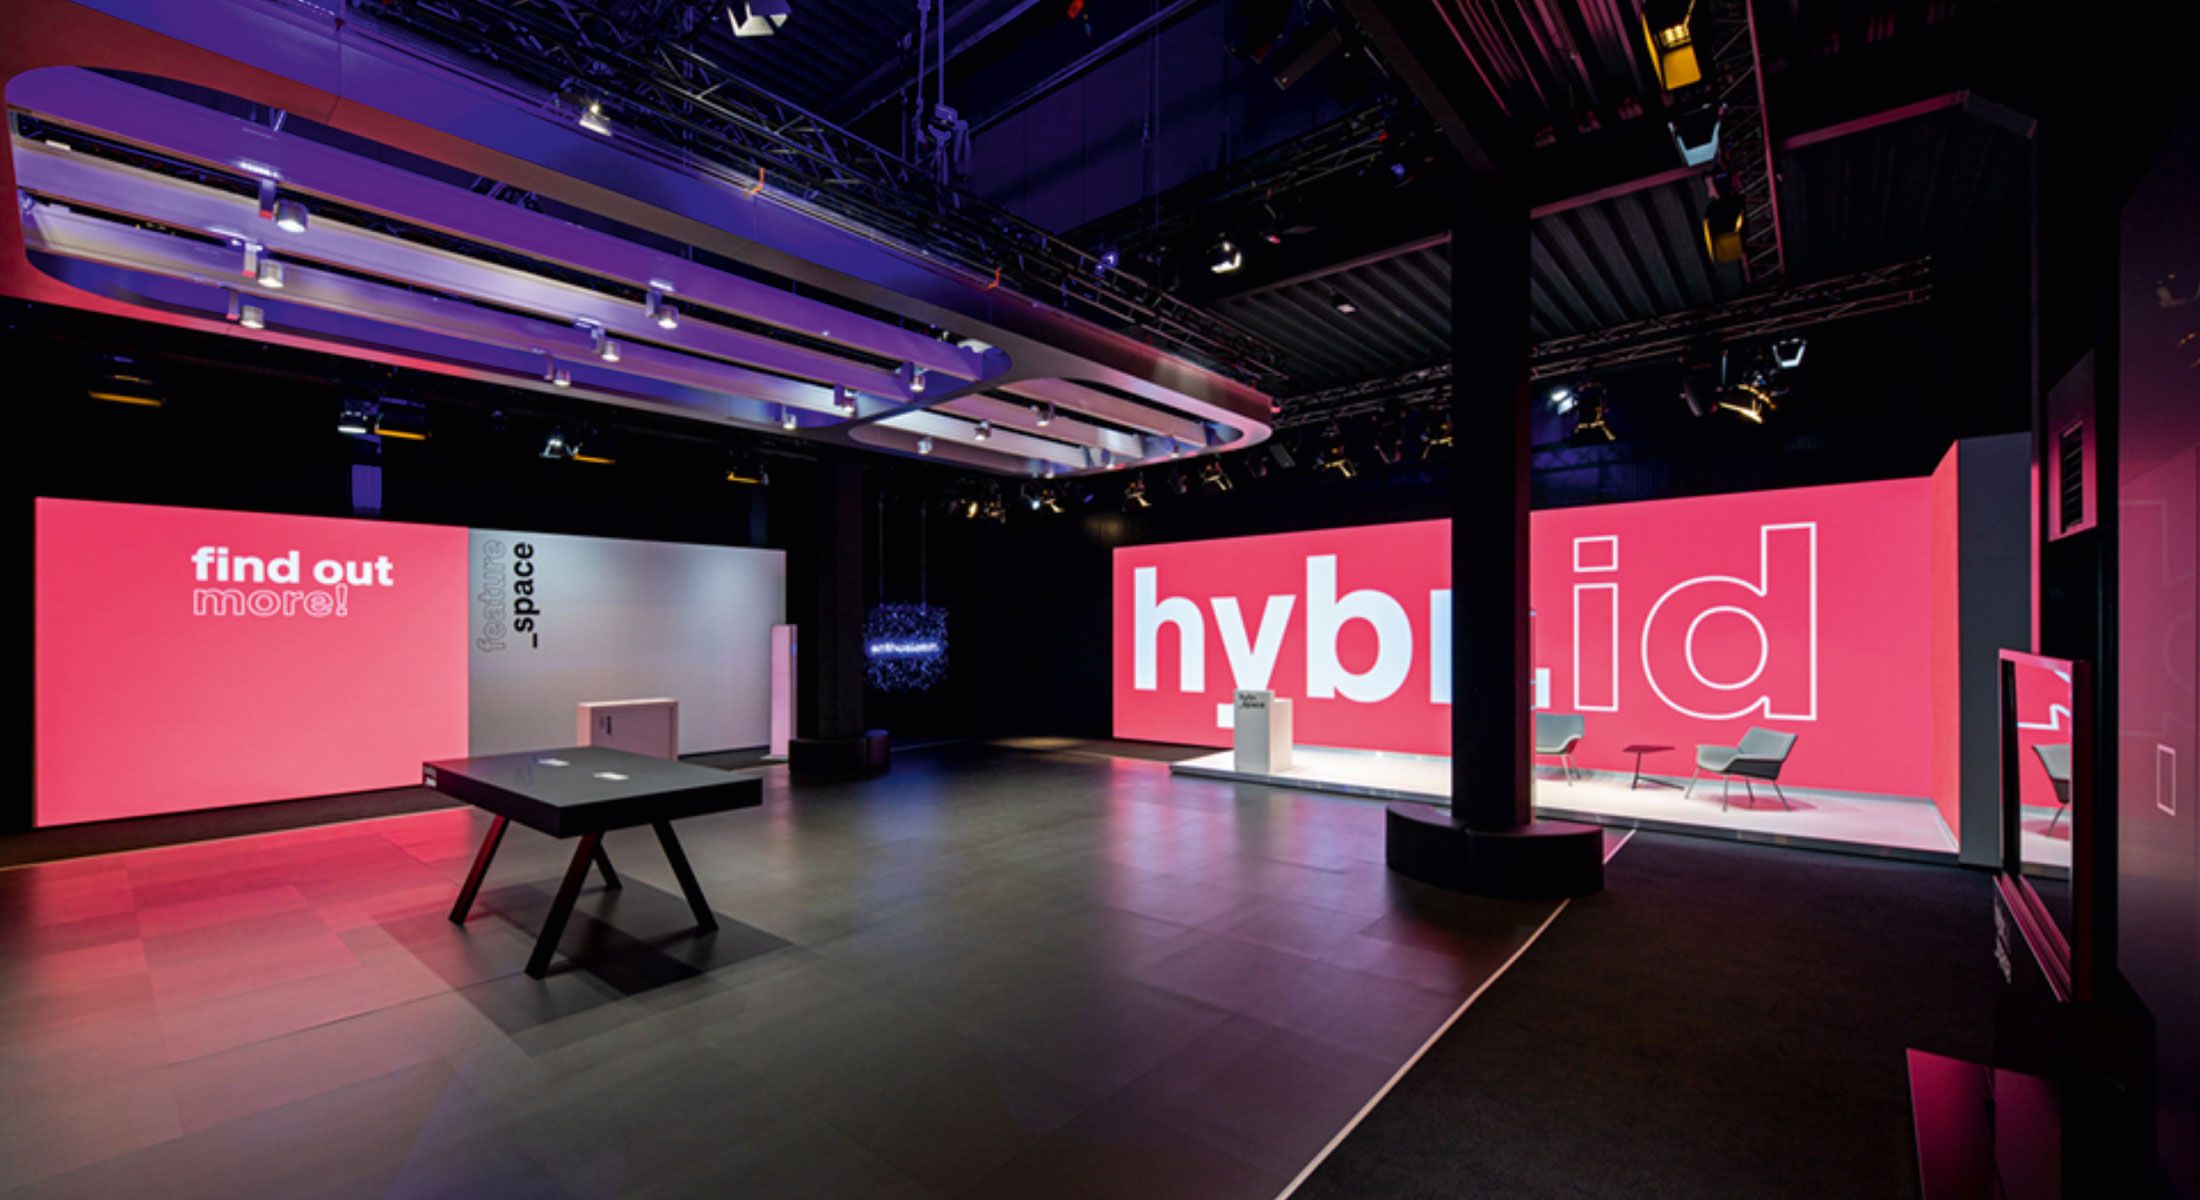 MCSH Veranstaltung: Hybrid Brand Experience